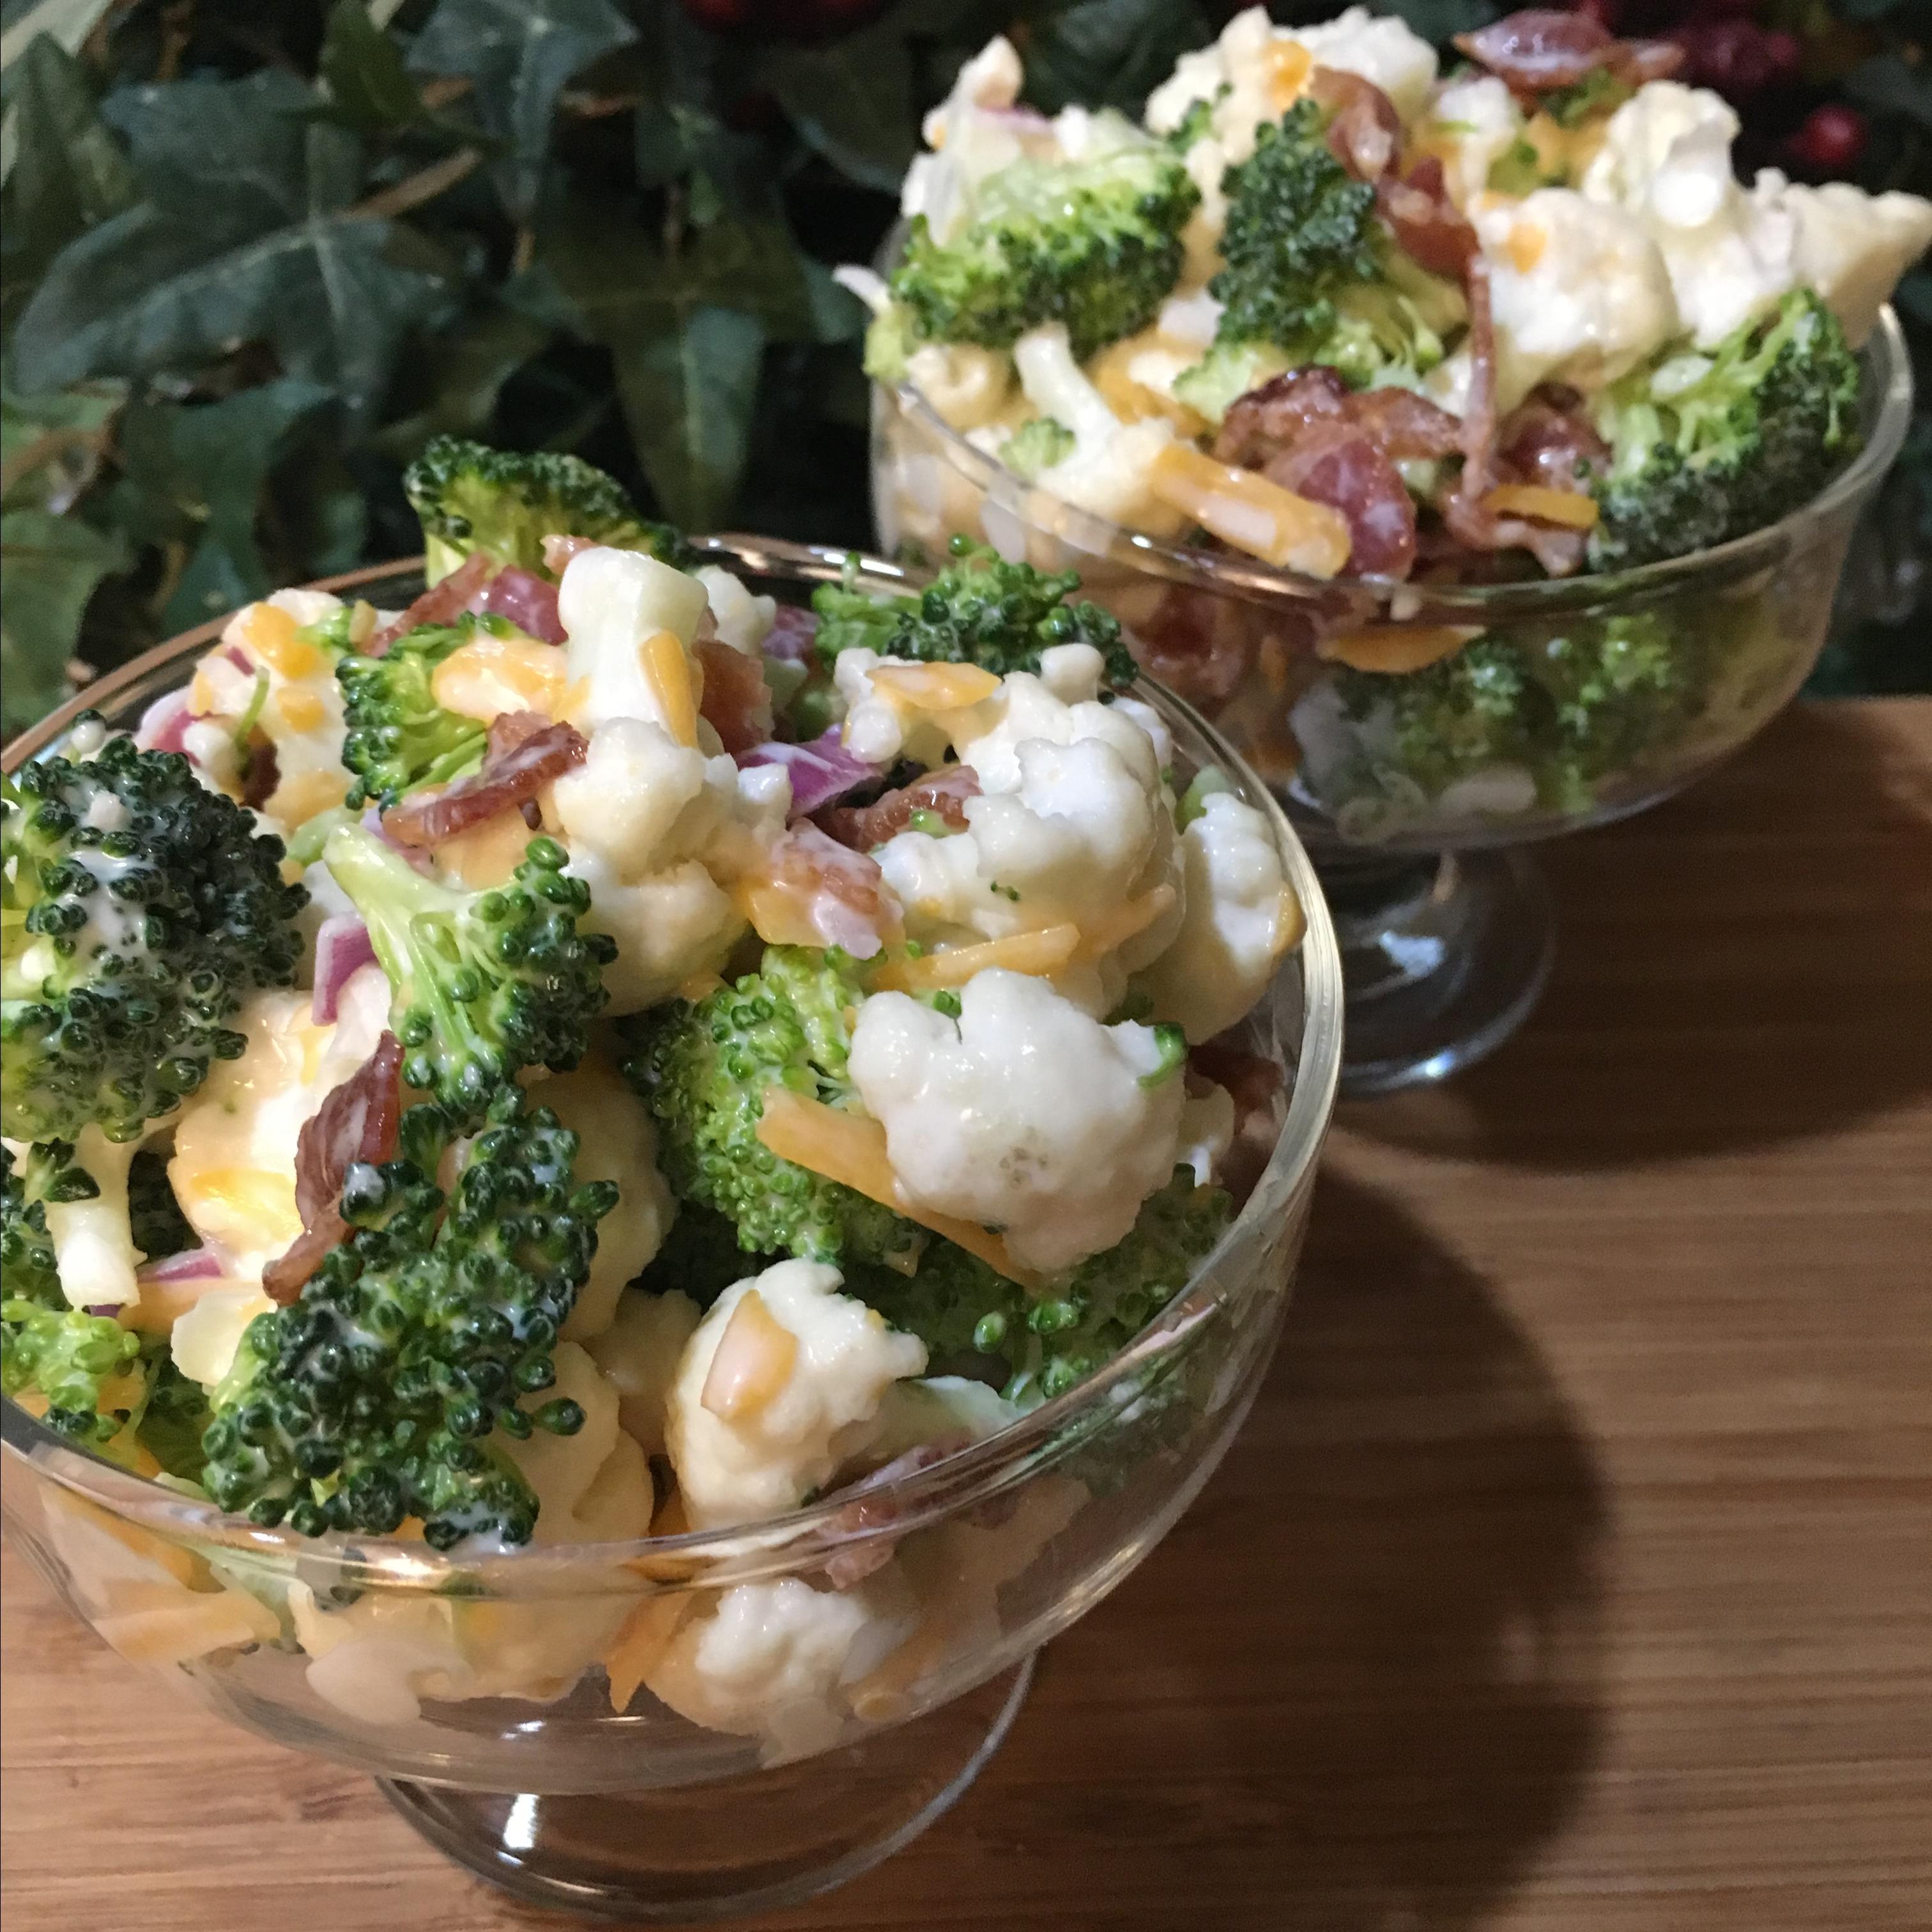 Bop's Broccoli Cauliflower Salad Paula